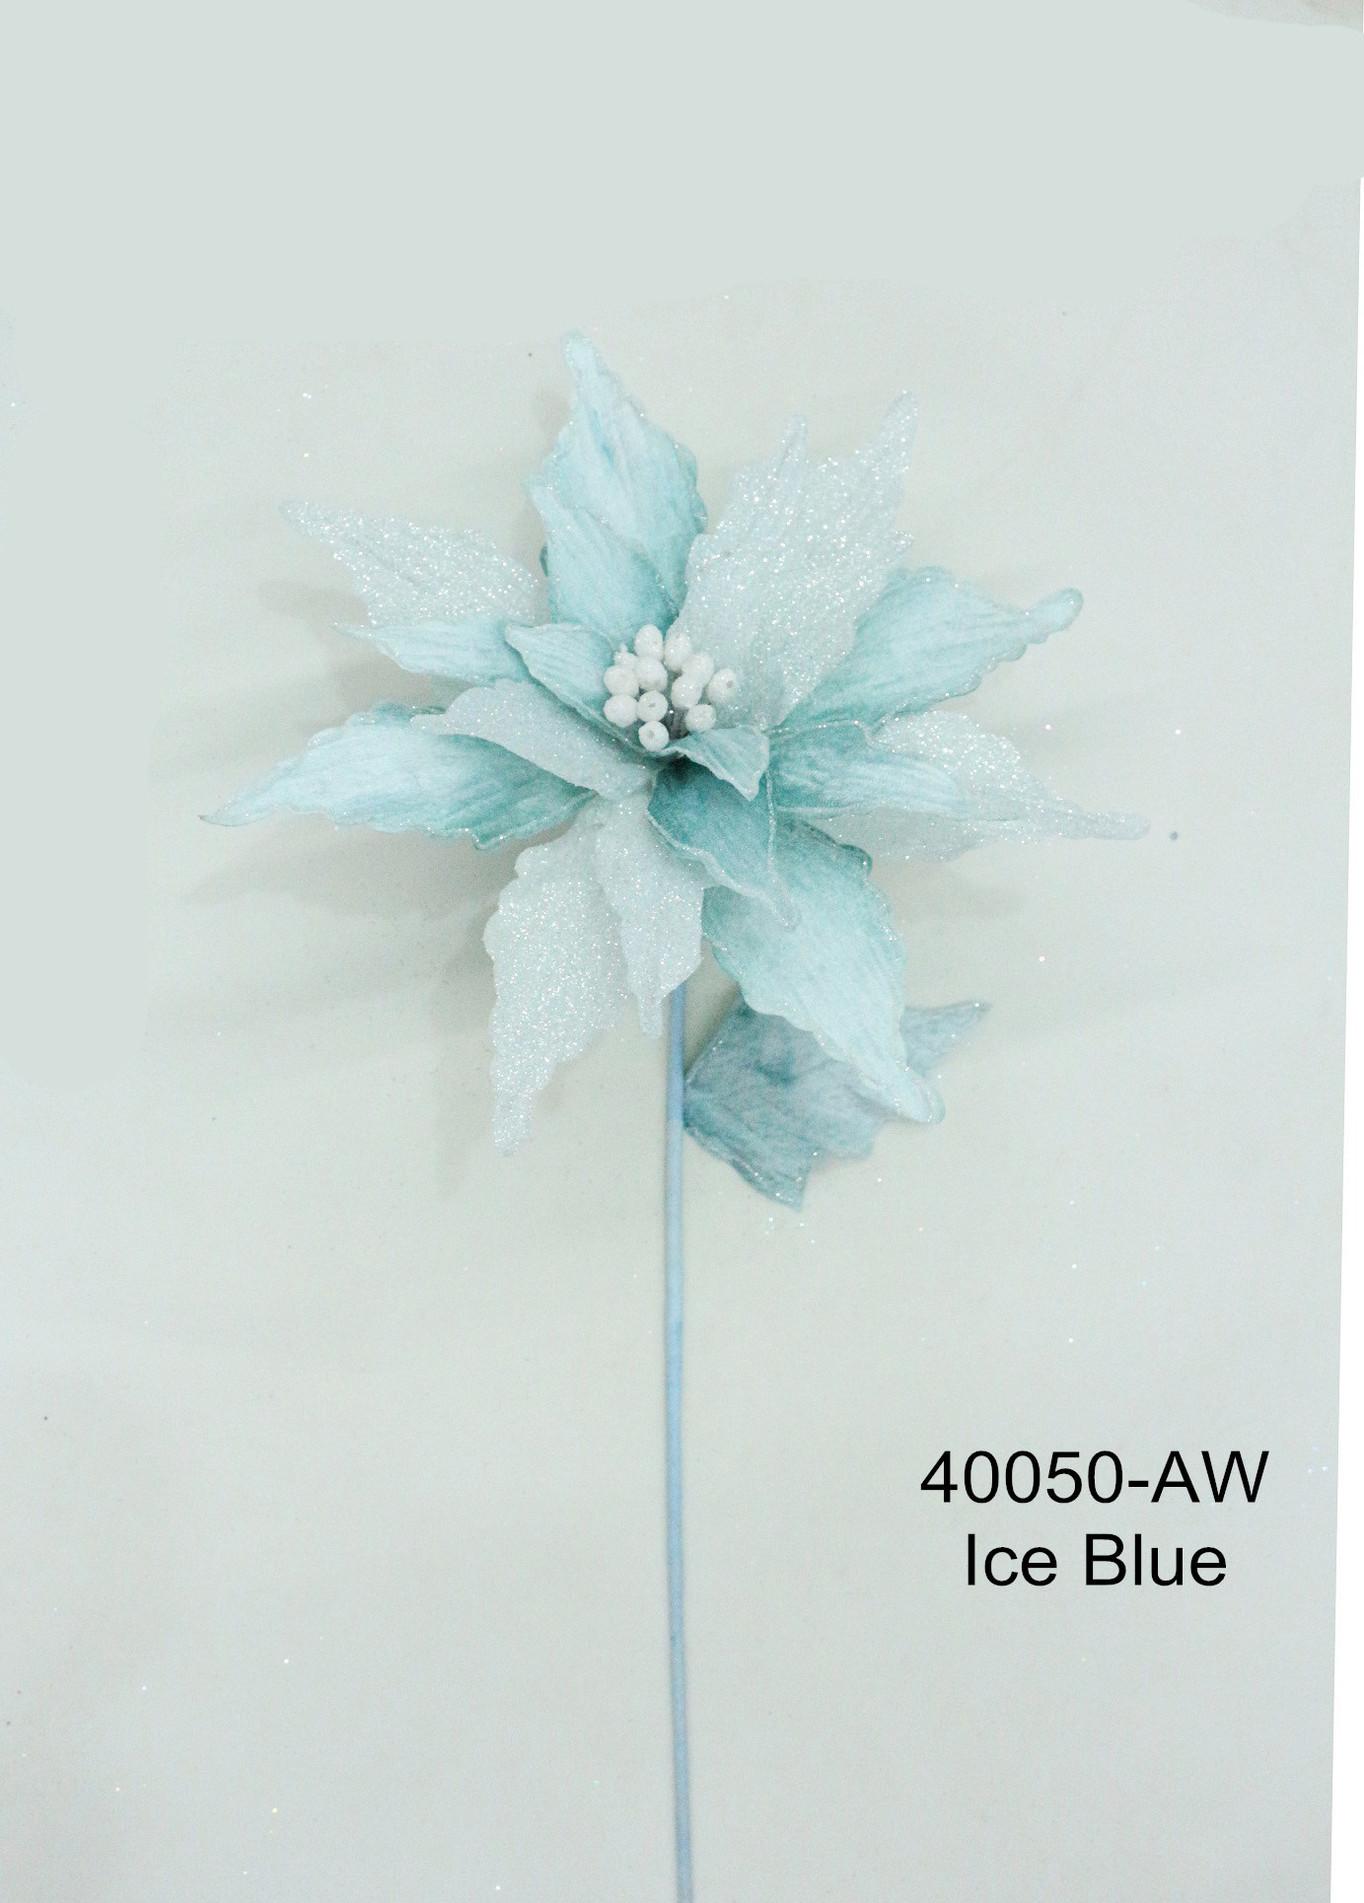 40050-AW